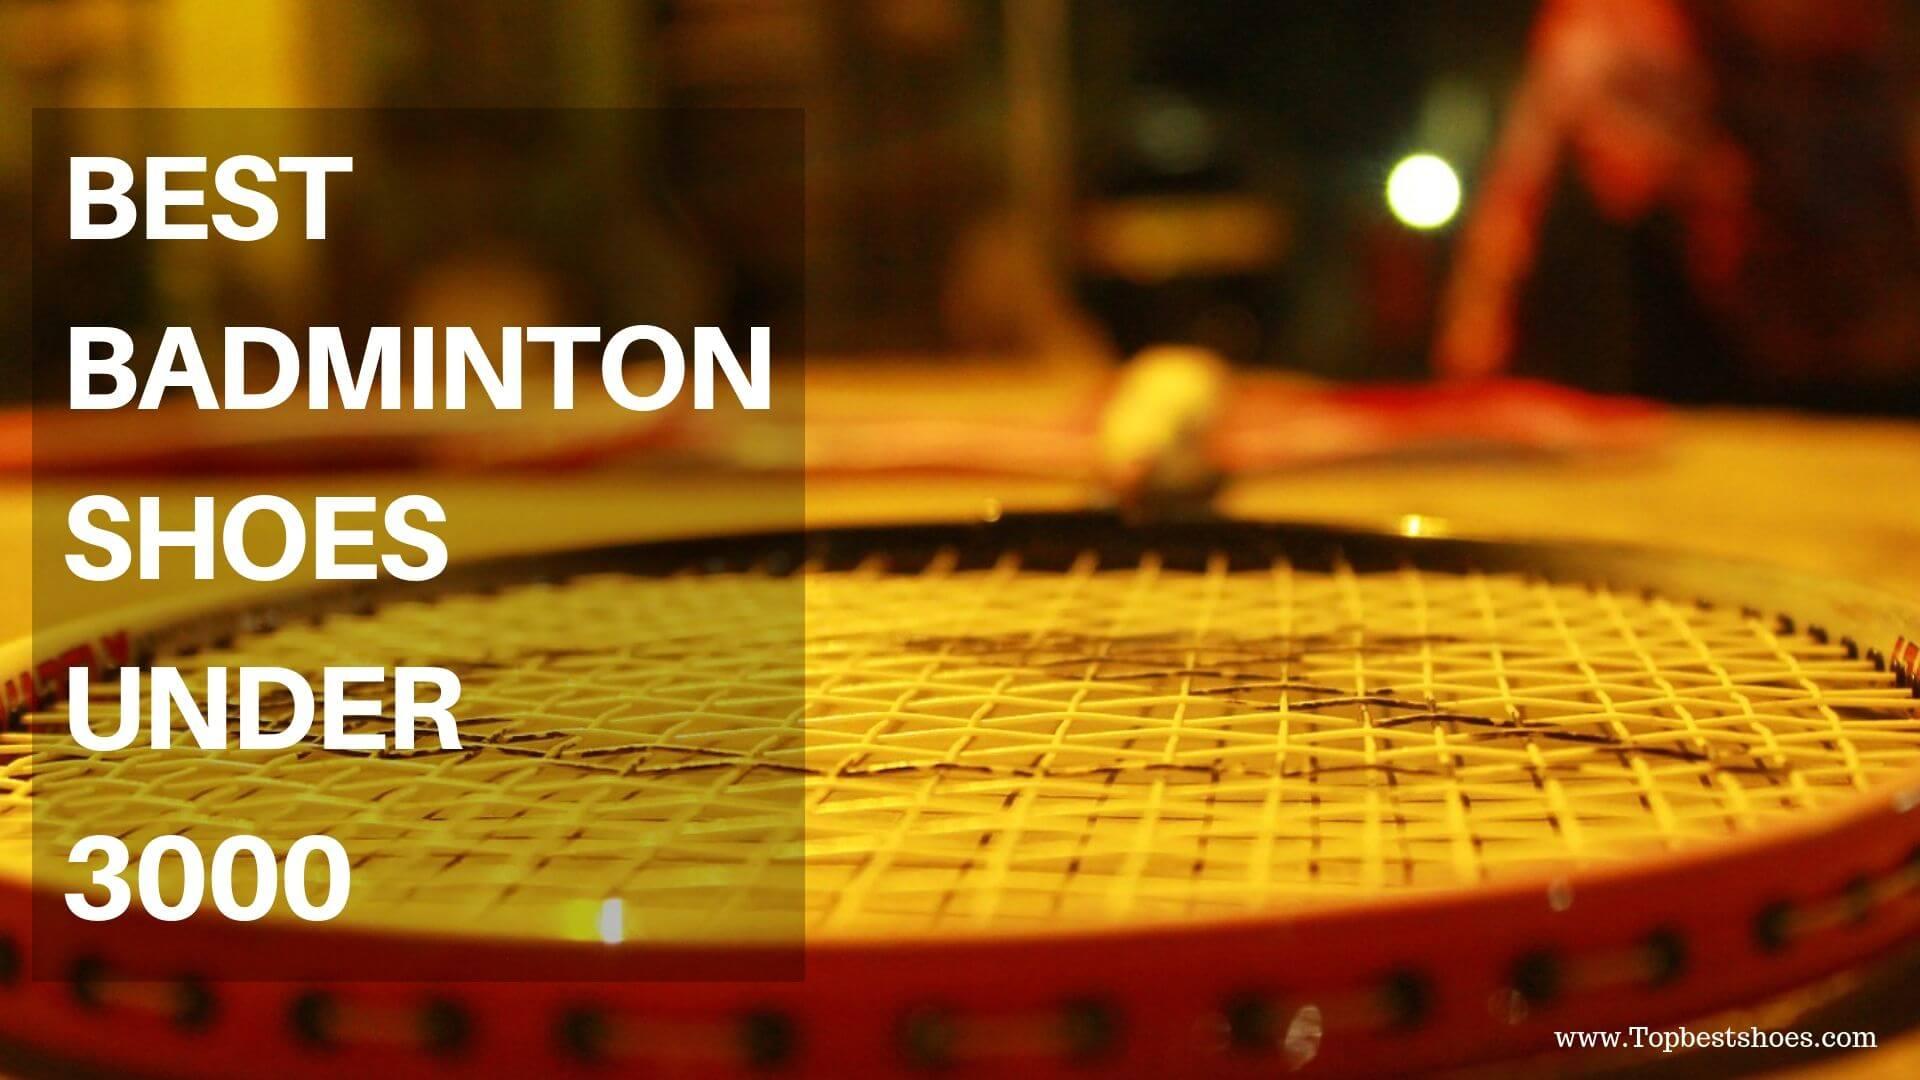 Top 10 Best Badminton Shoes Under 3000 In India | 2019